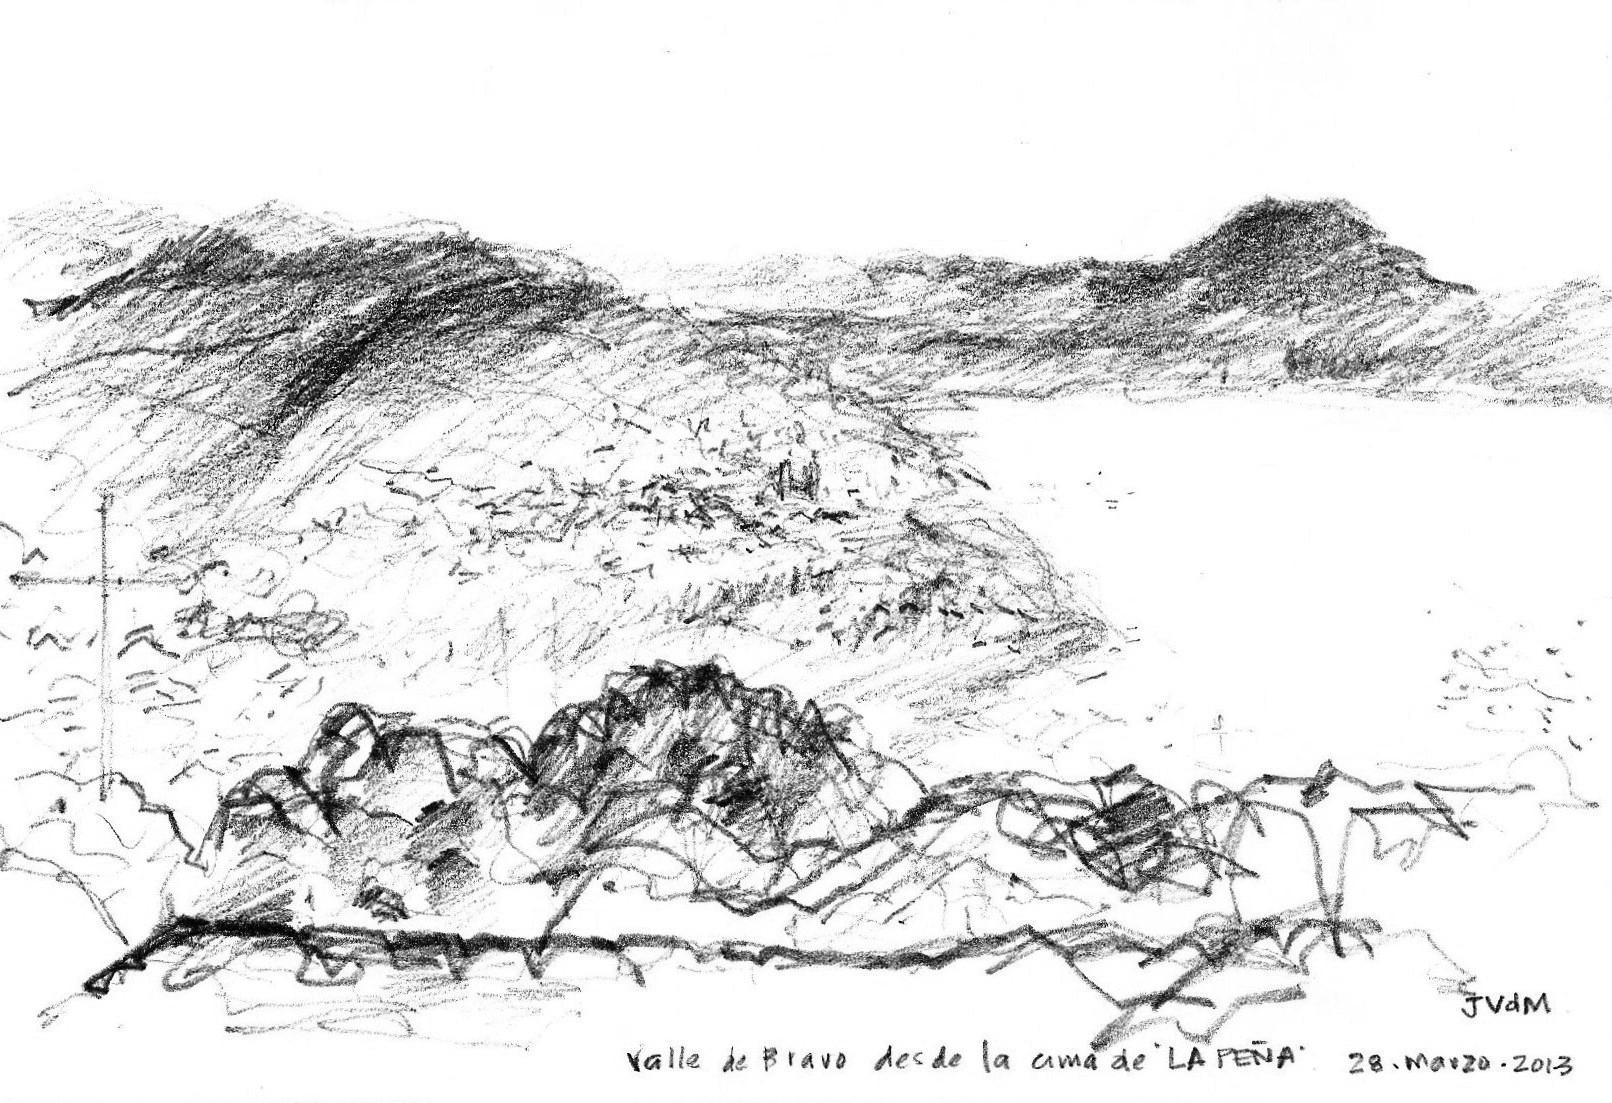 Valle de Bravo abr13 -03.jpg